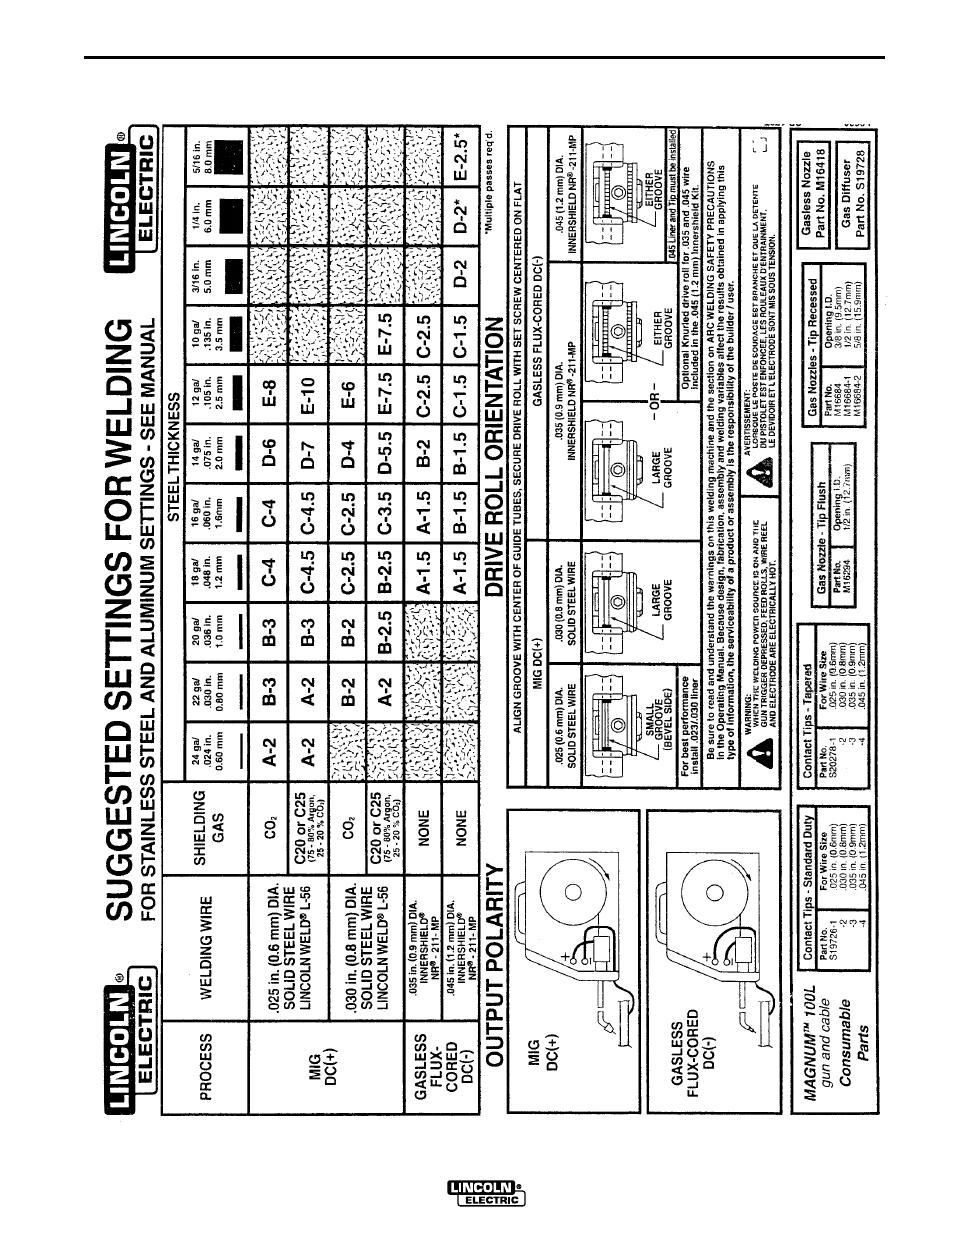 Beautiful Mig Gasless Welding Chart Sketch - Simple Wiring Diagram ...